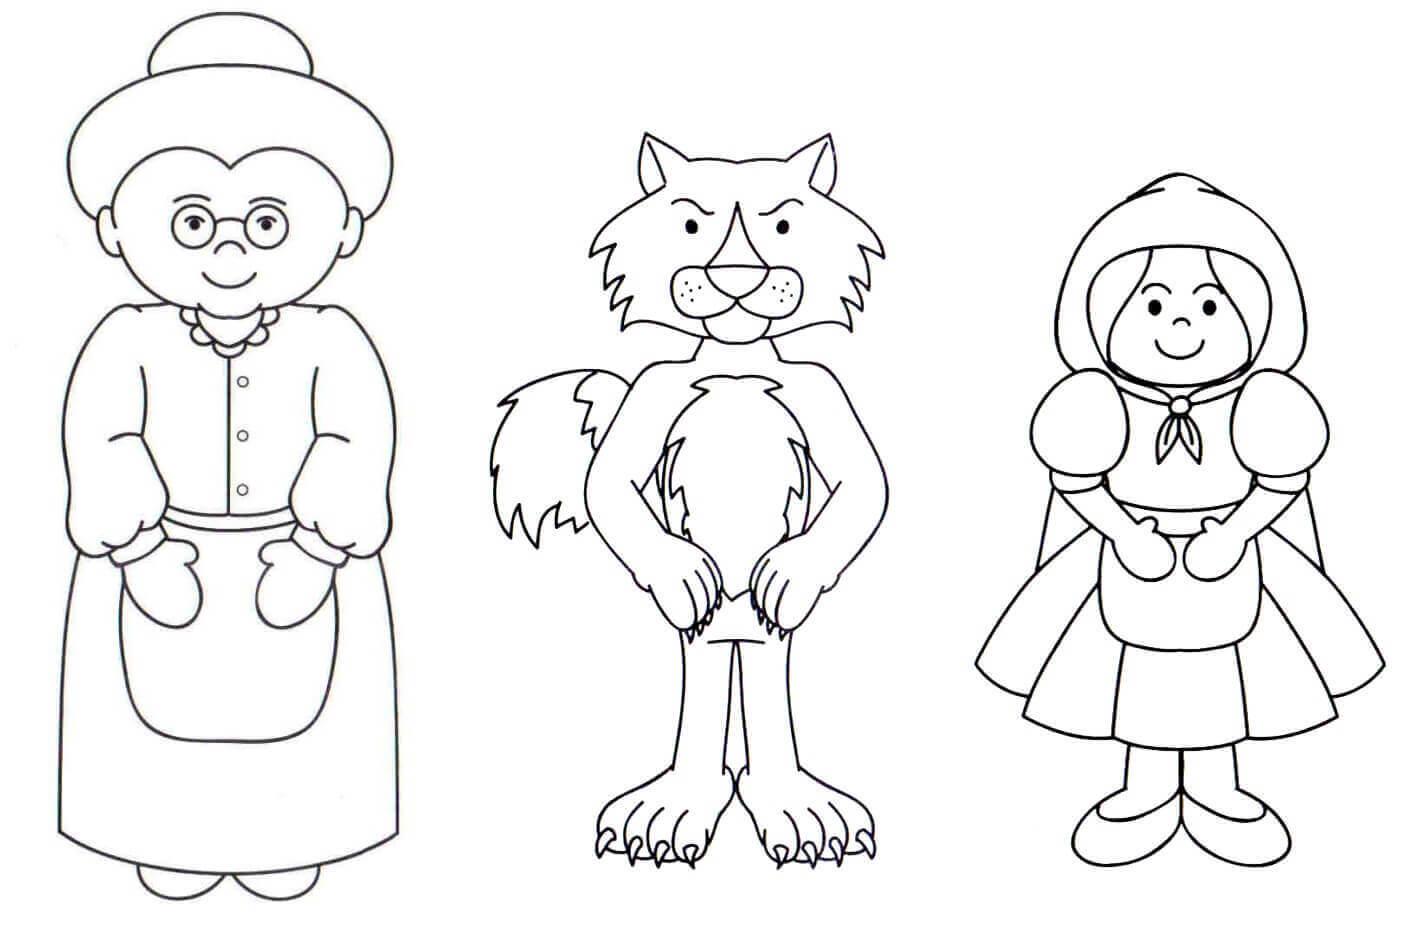 Dibujos Para Colorear De Caperucita Roja Caperucita Roja